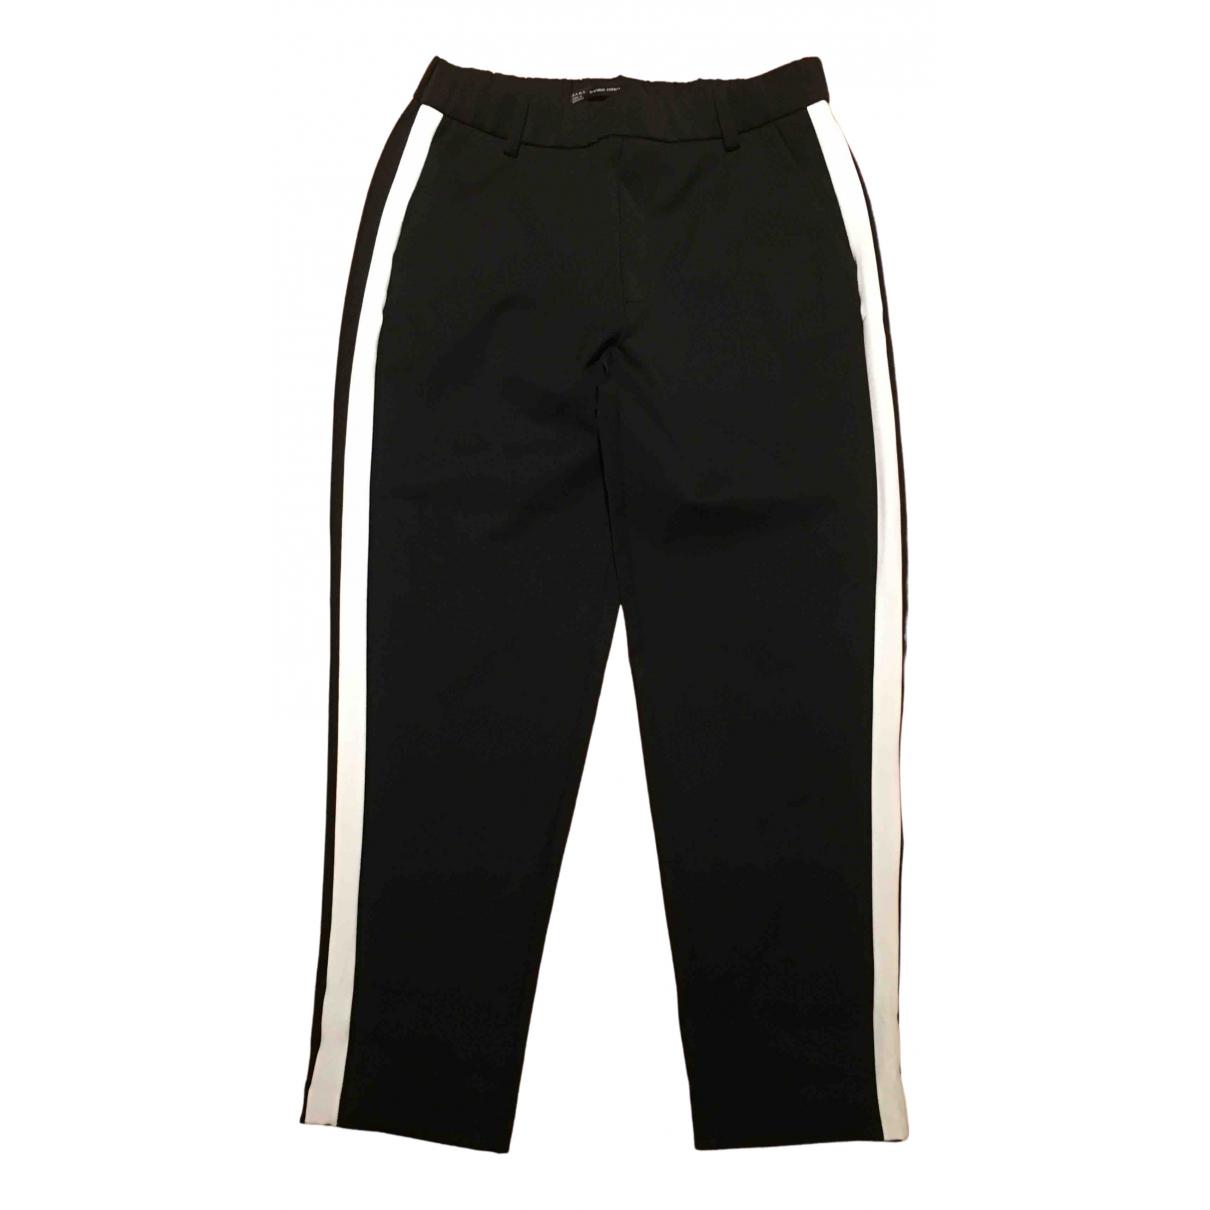 Zara N Black Trousers for Women XS International